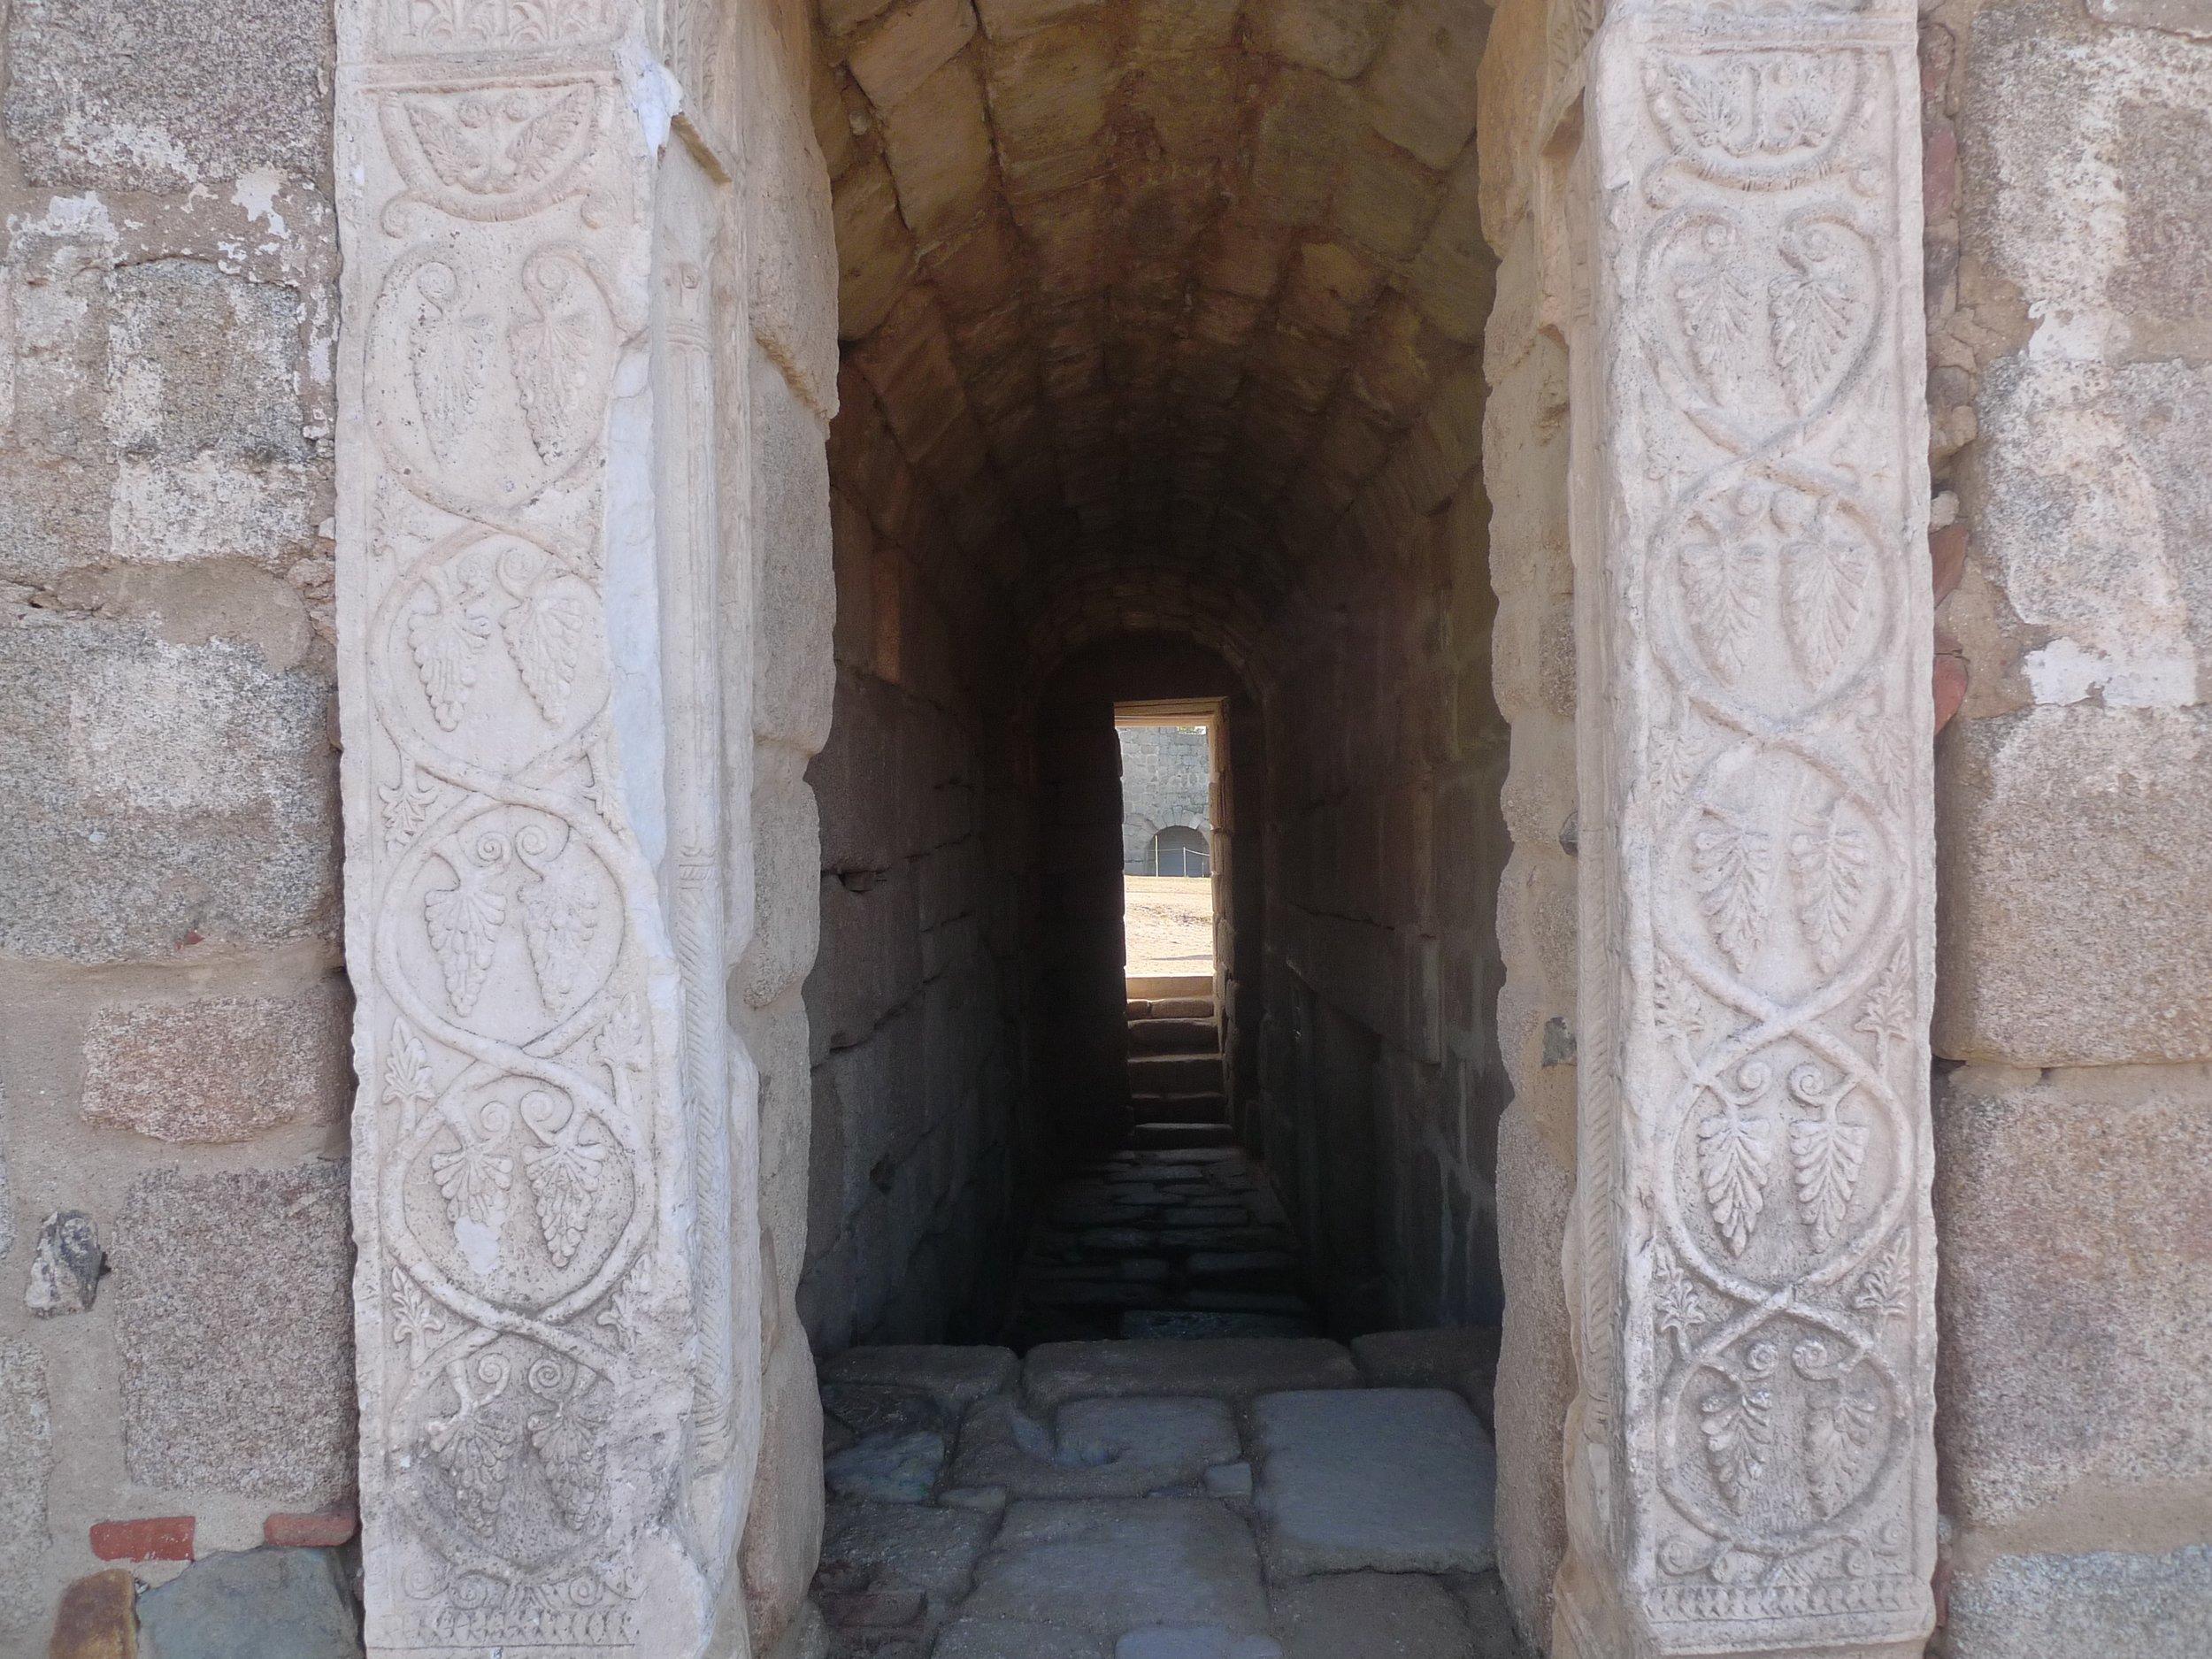 Entrance to the cistern at Alcazaba with Visigoth pillars